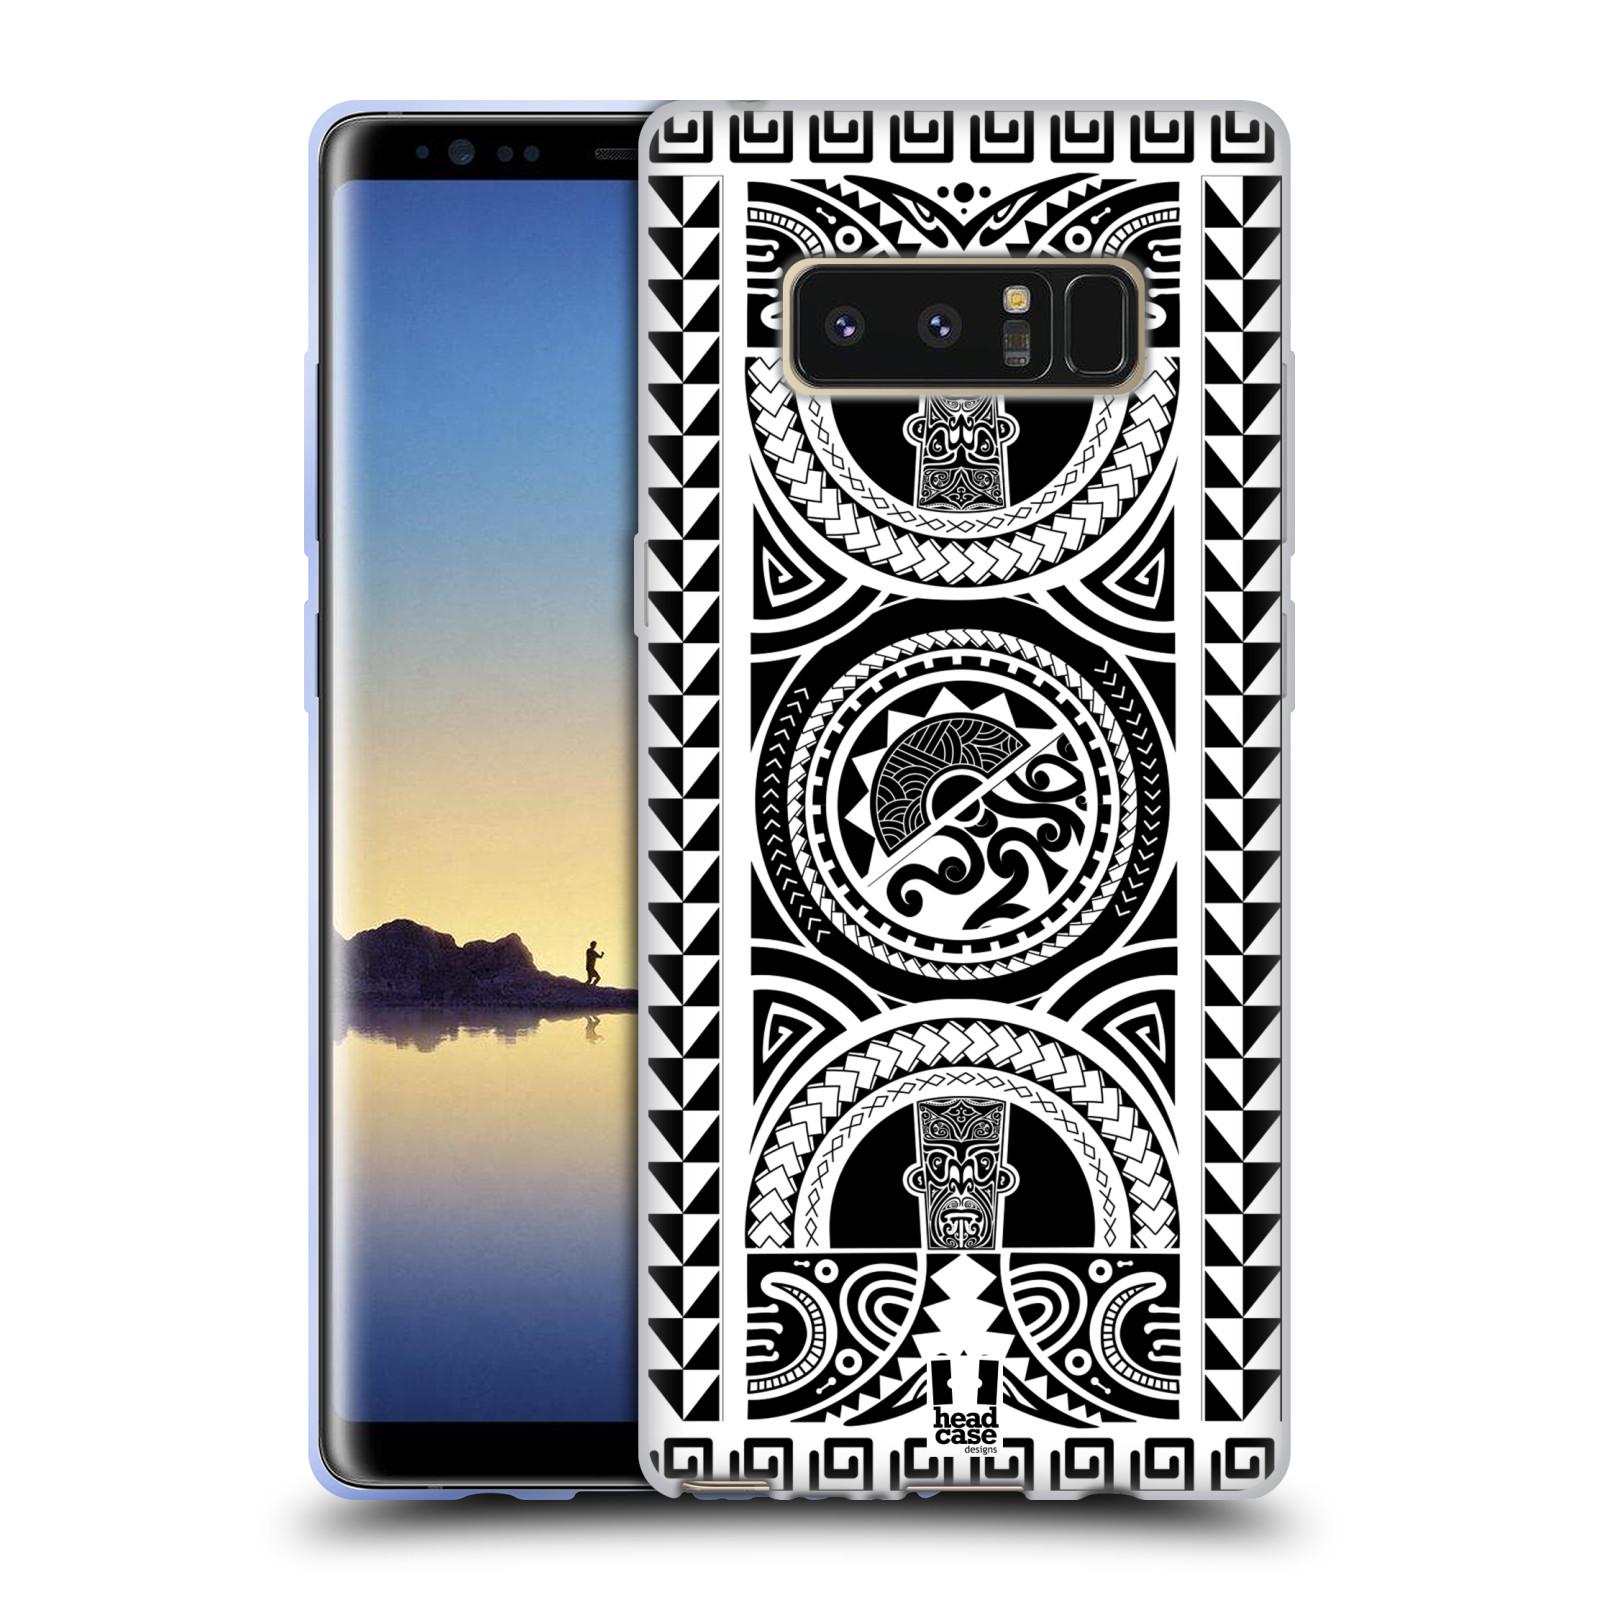 HEAD CASE silikonový obal na mobil Samsung Galaxy Note 8 vzor Maorské tetování motivy černá a bílá KRUH